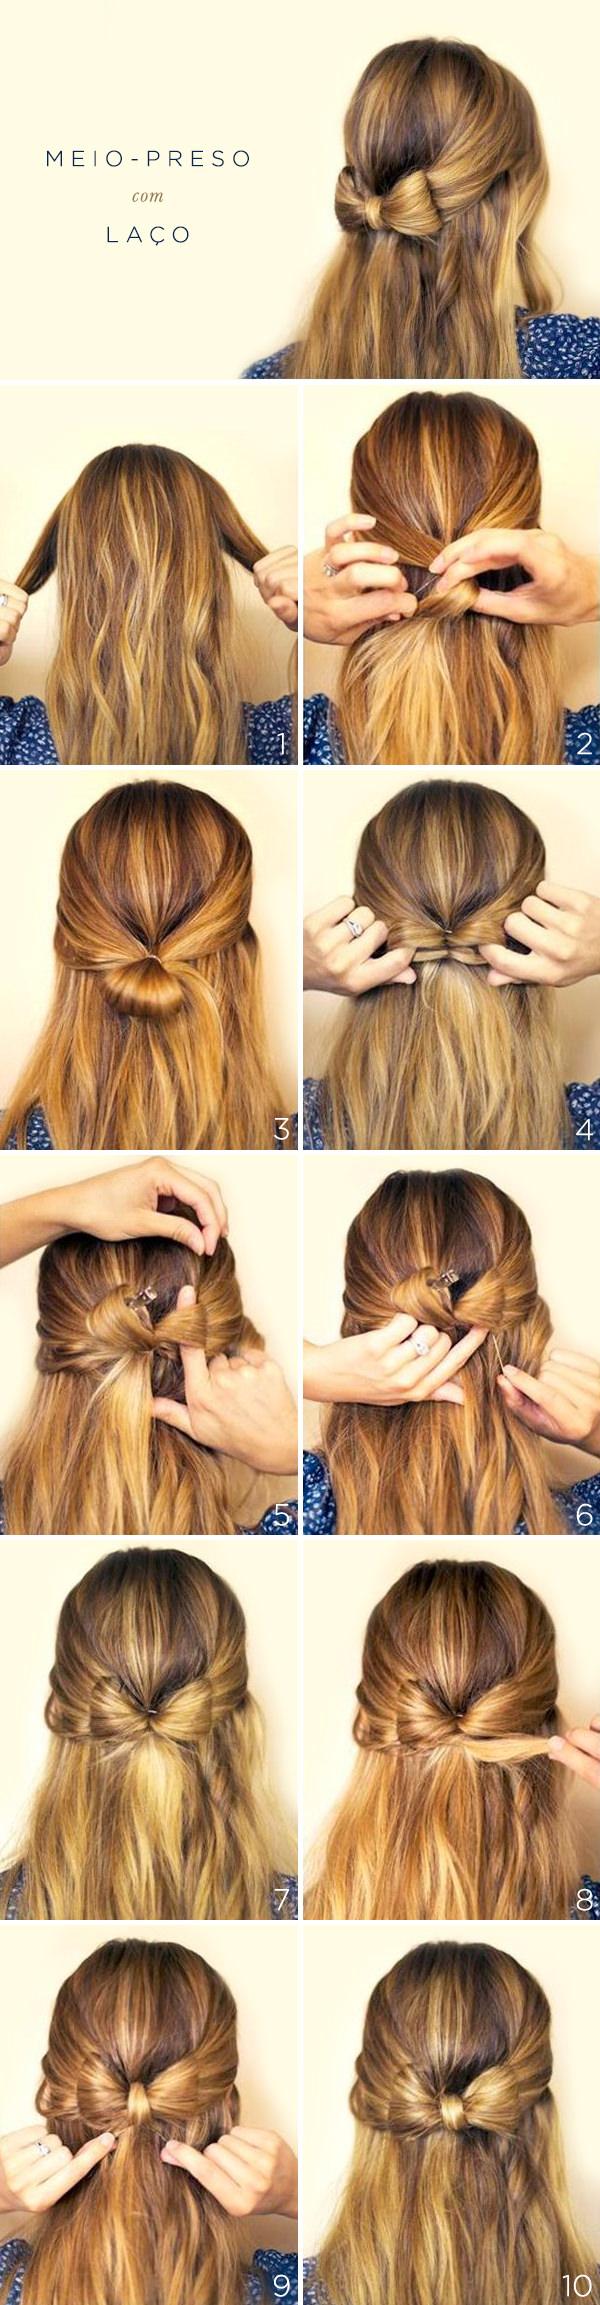 tutorial-penteado-meio-preso-com-laco